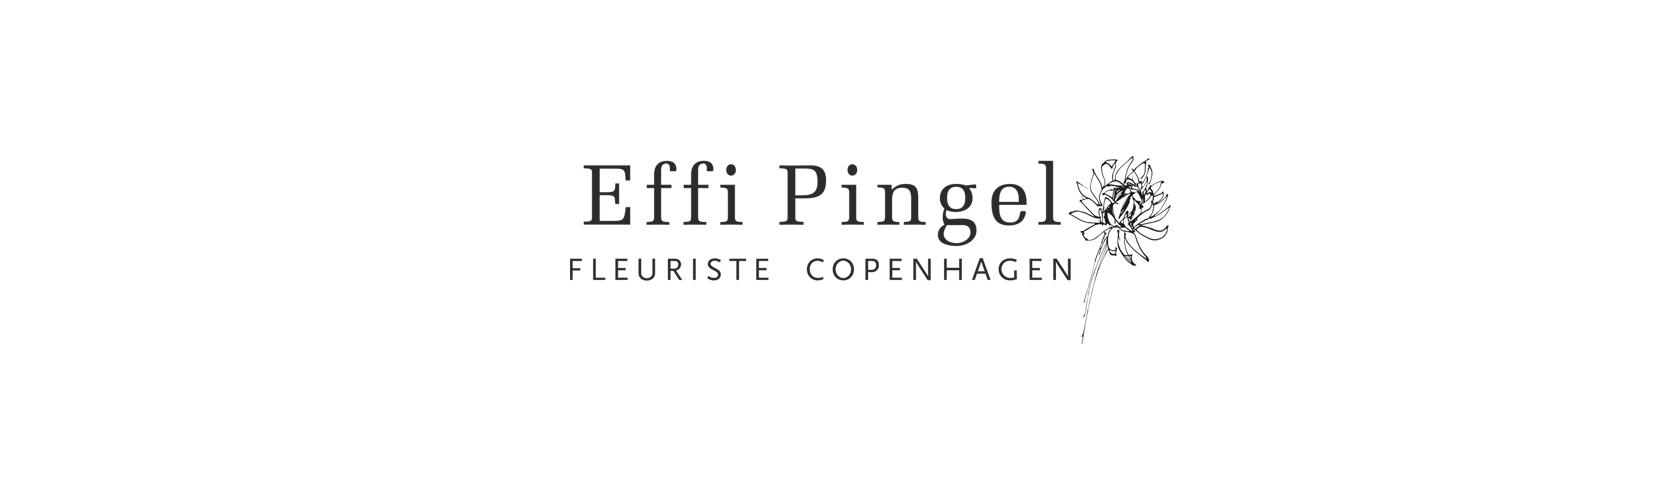 Effi-fleuriste-025